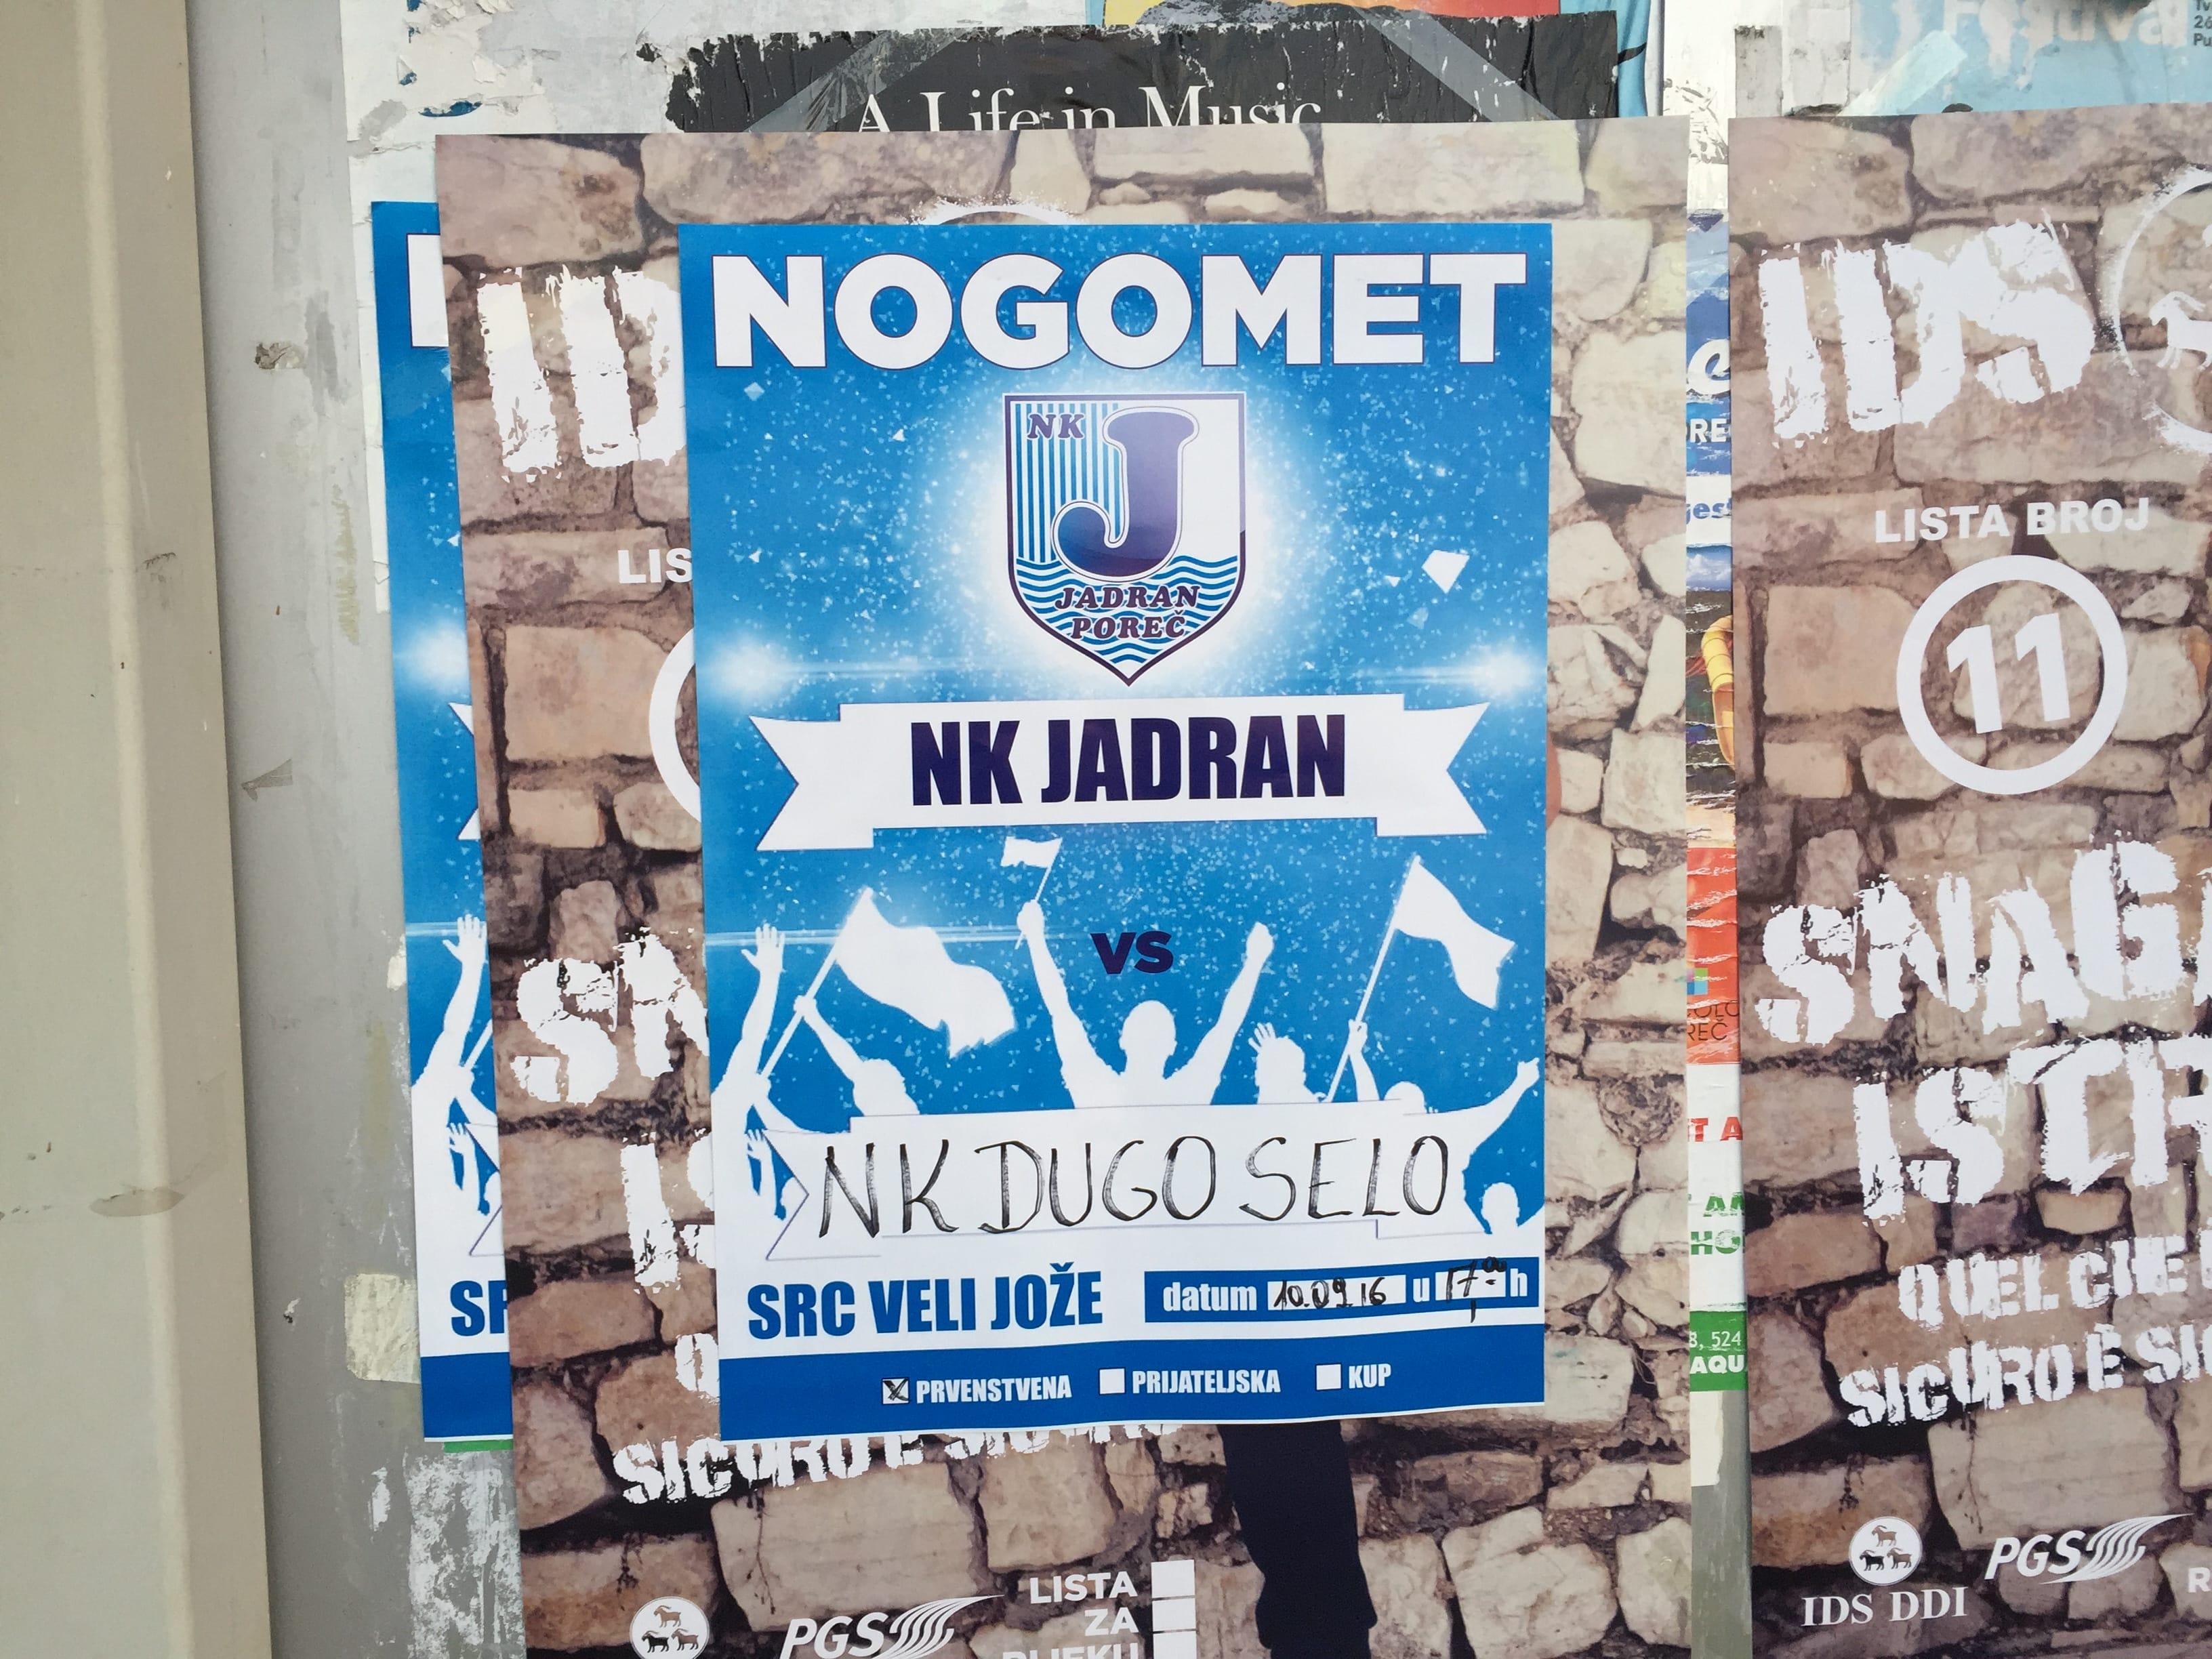 NK Jadran Porec 1 NK Dugo Selo 1